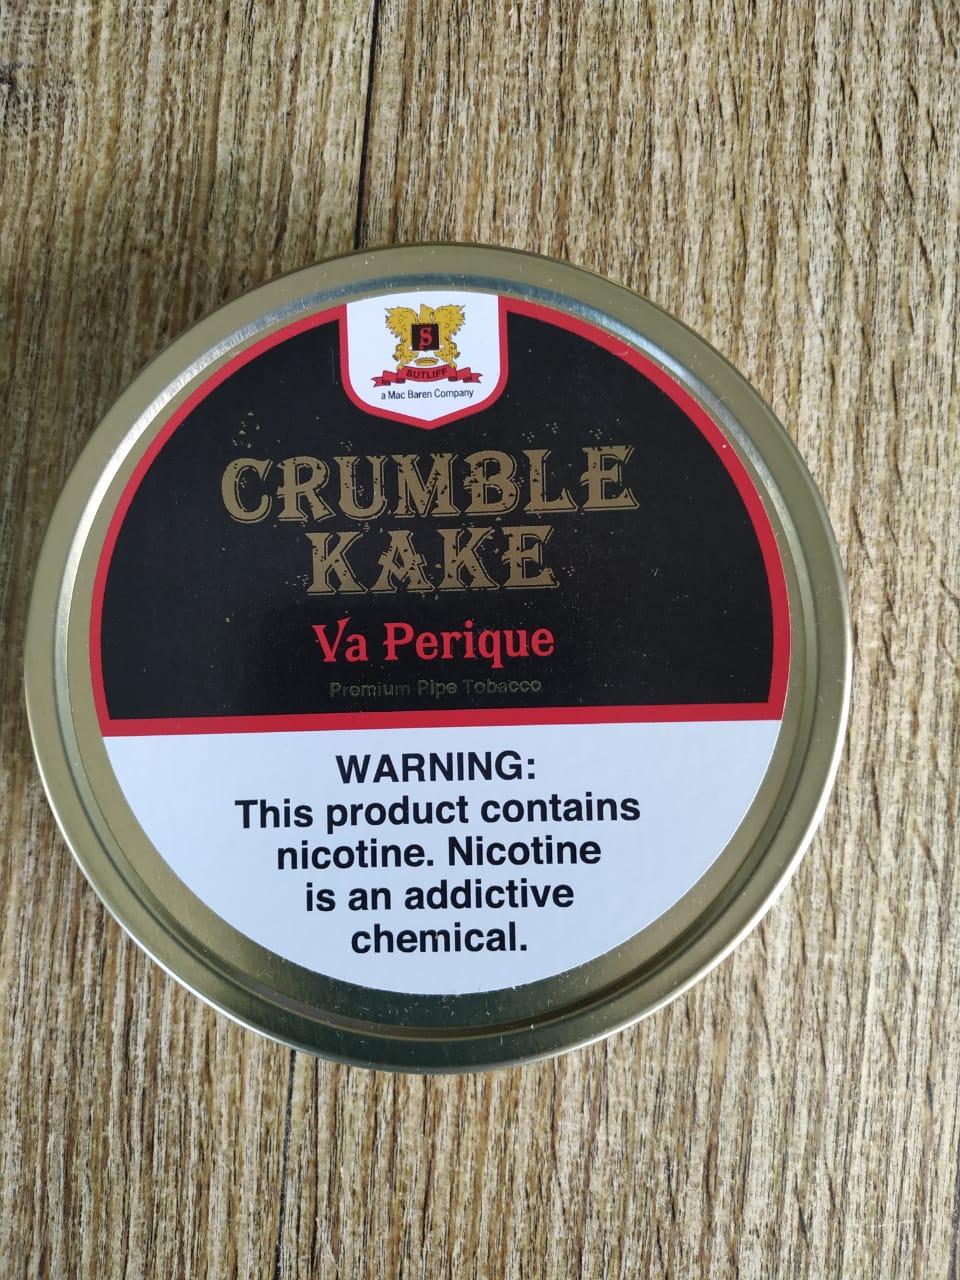 Sutliff Tobacco Company - Crumble Kake Va. Perique